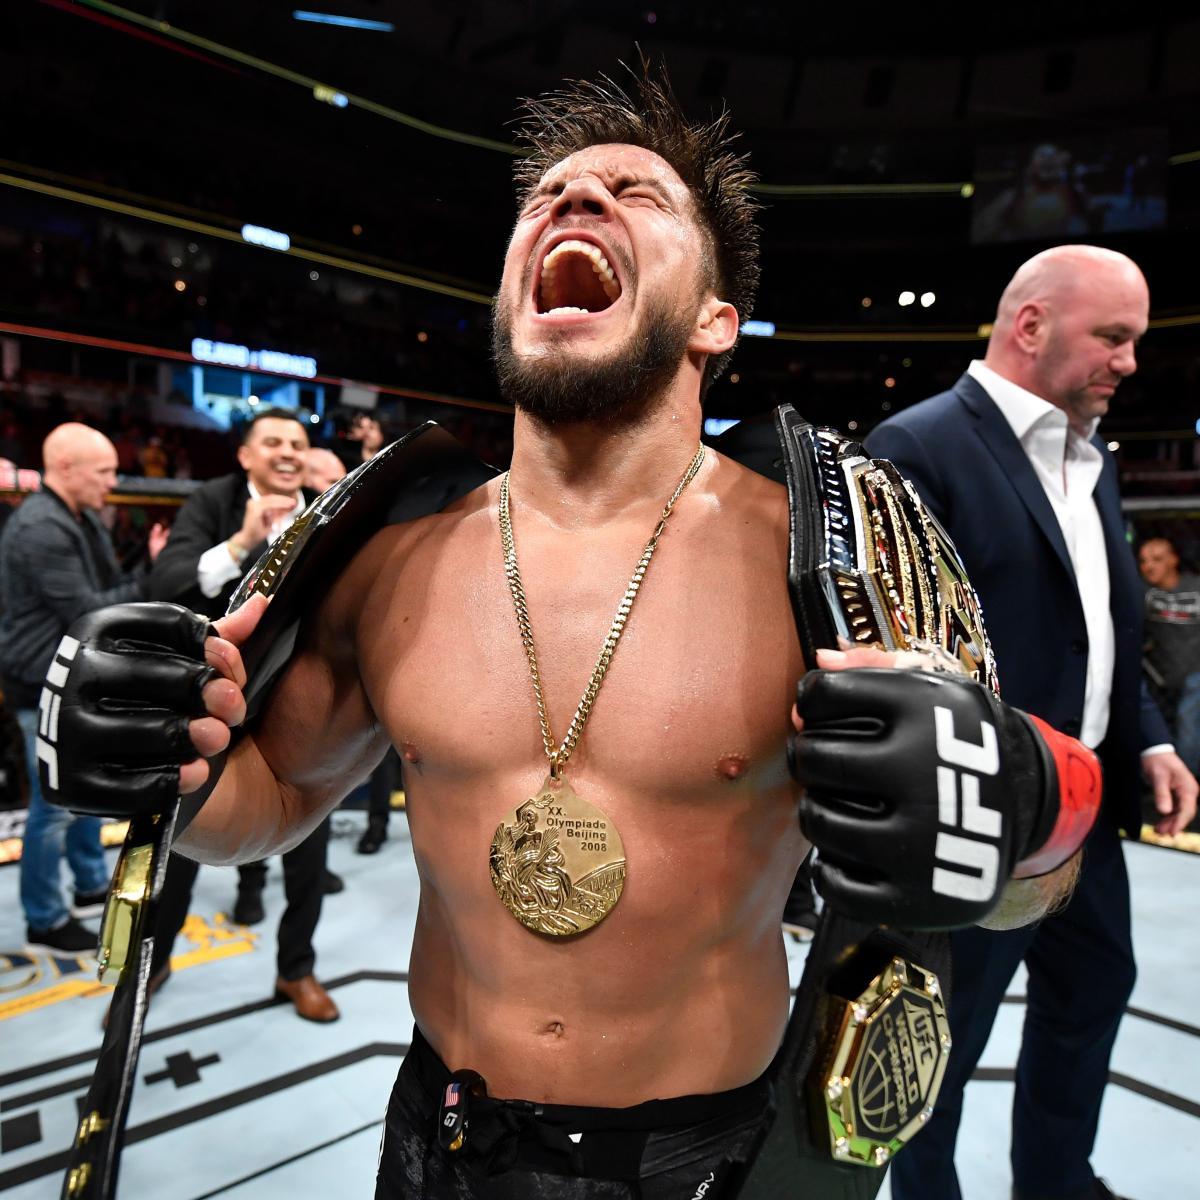 Henry Cejudo Is UFC's Strangest Superstar After Becoming 2-Division Champion